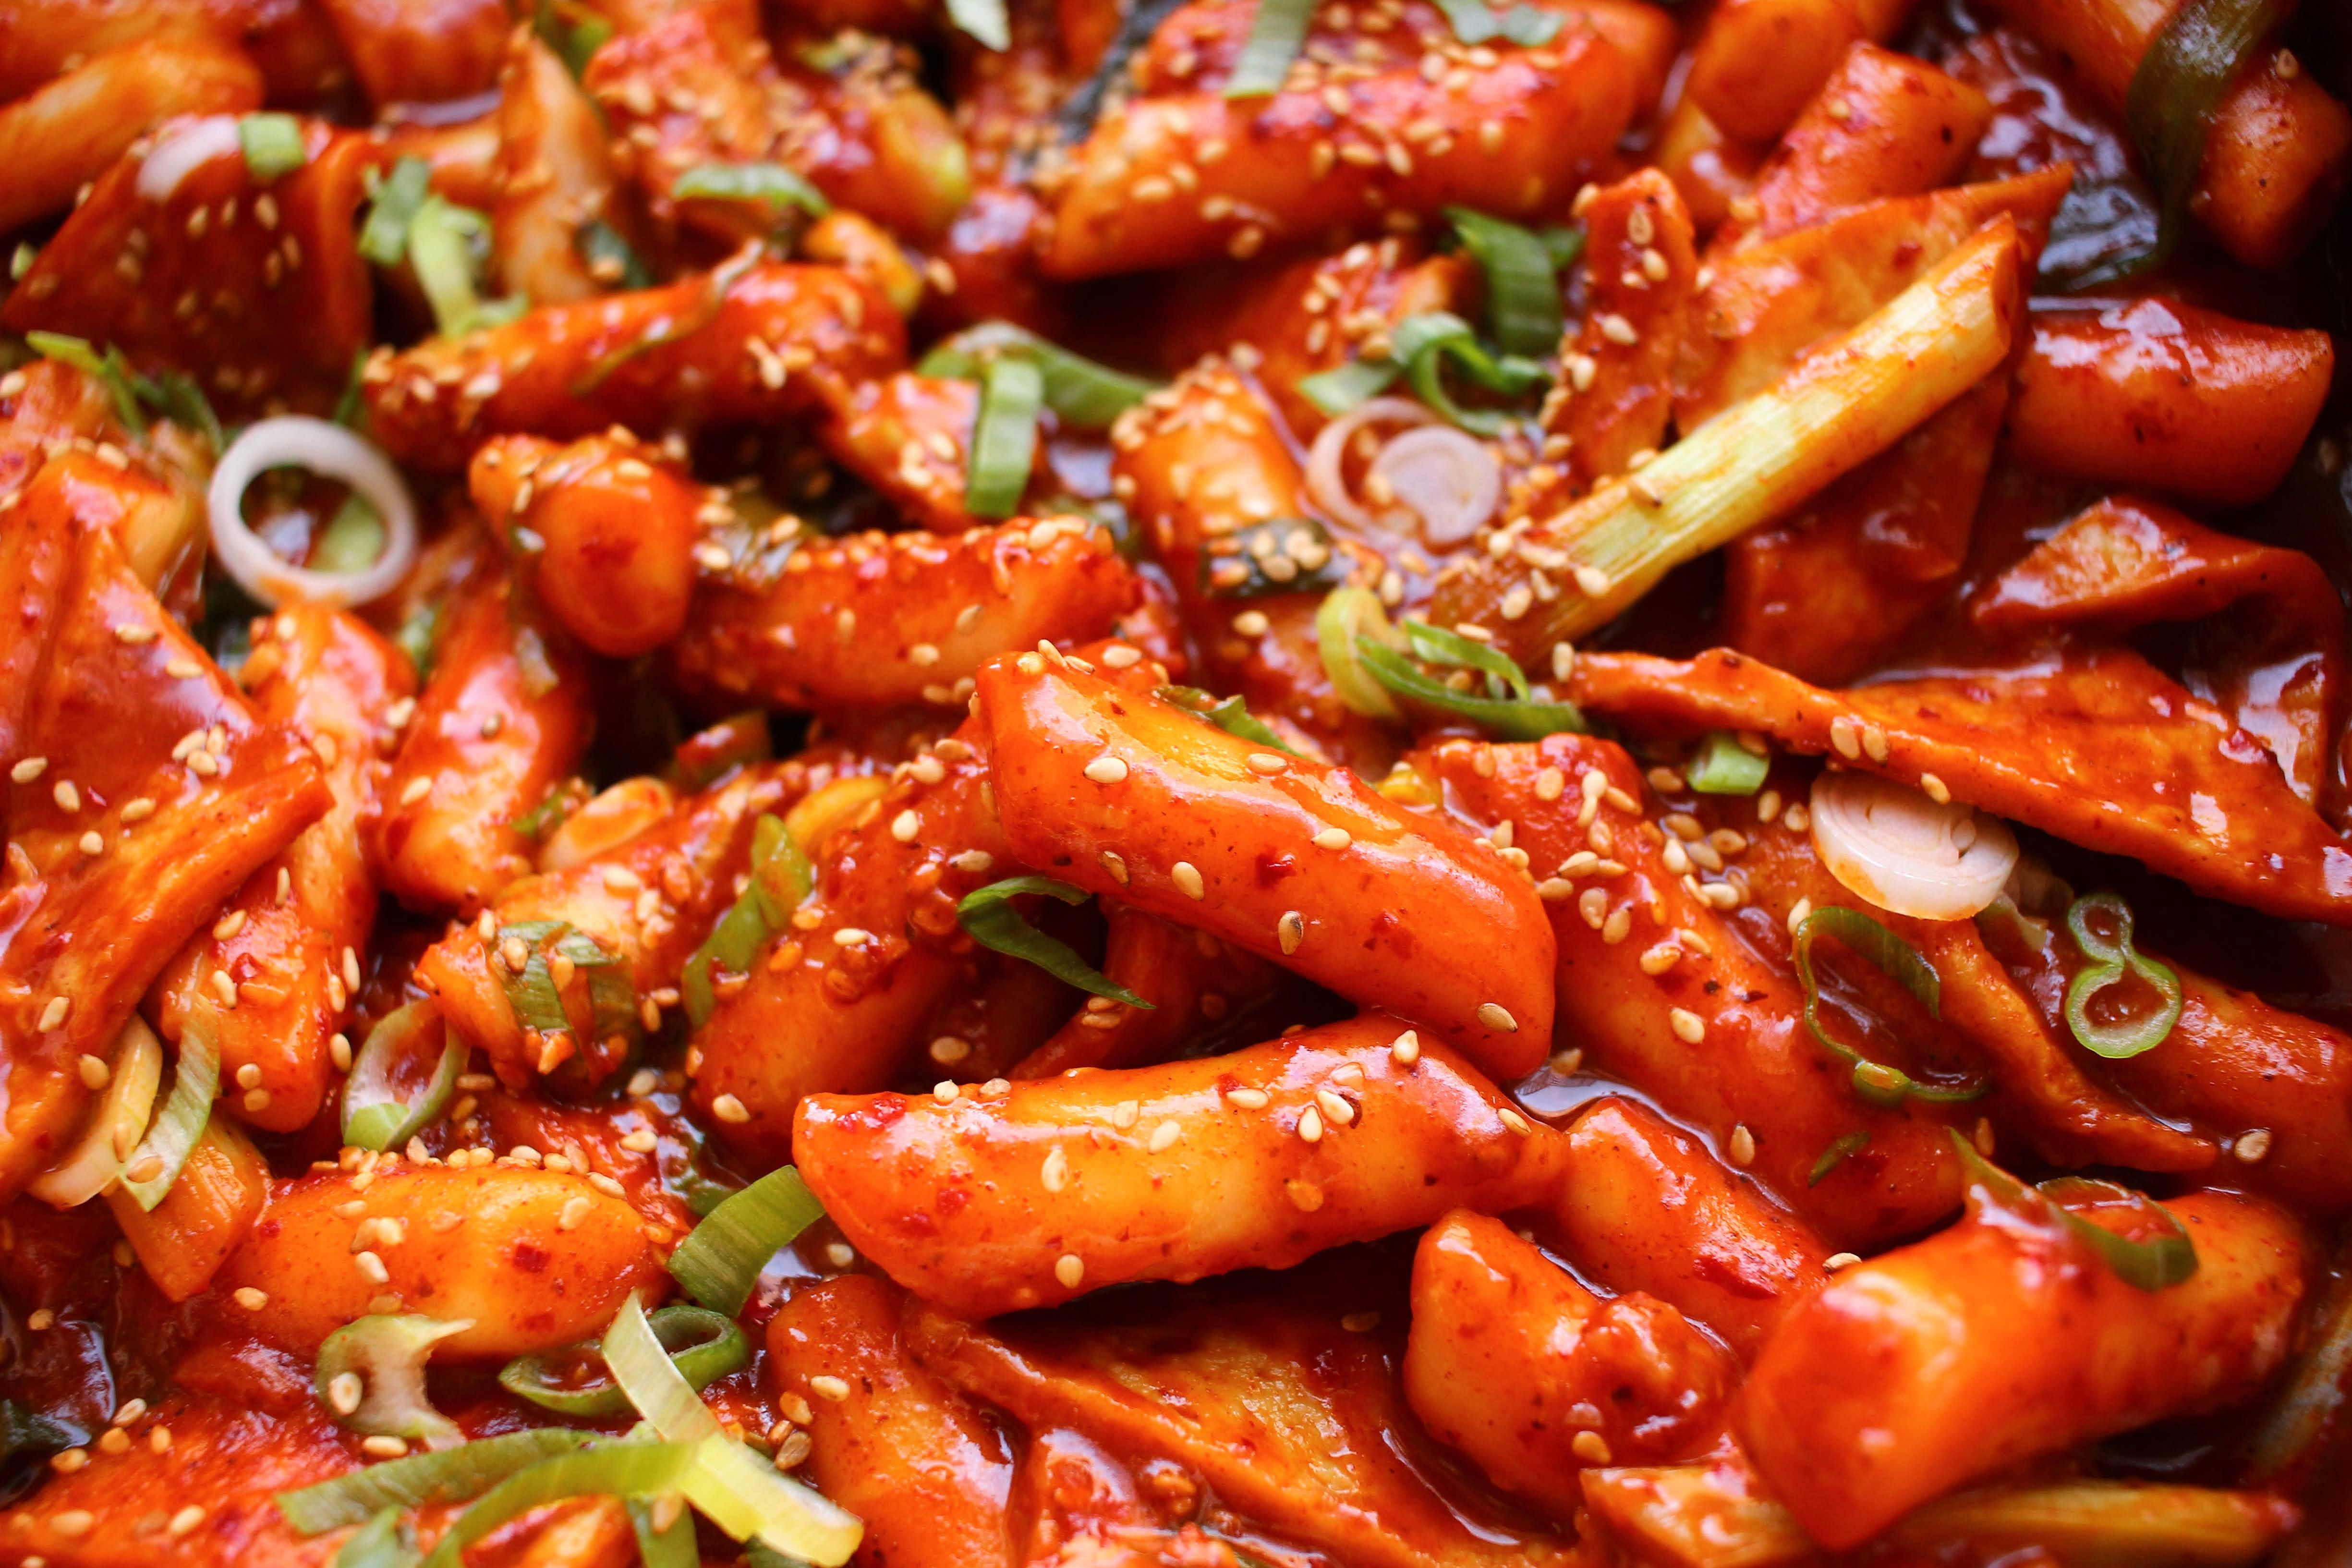 Best Tteokbokki Recipe How To Make Spicy Korean Rice Cakes